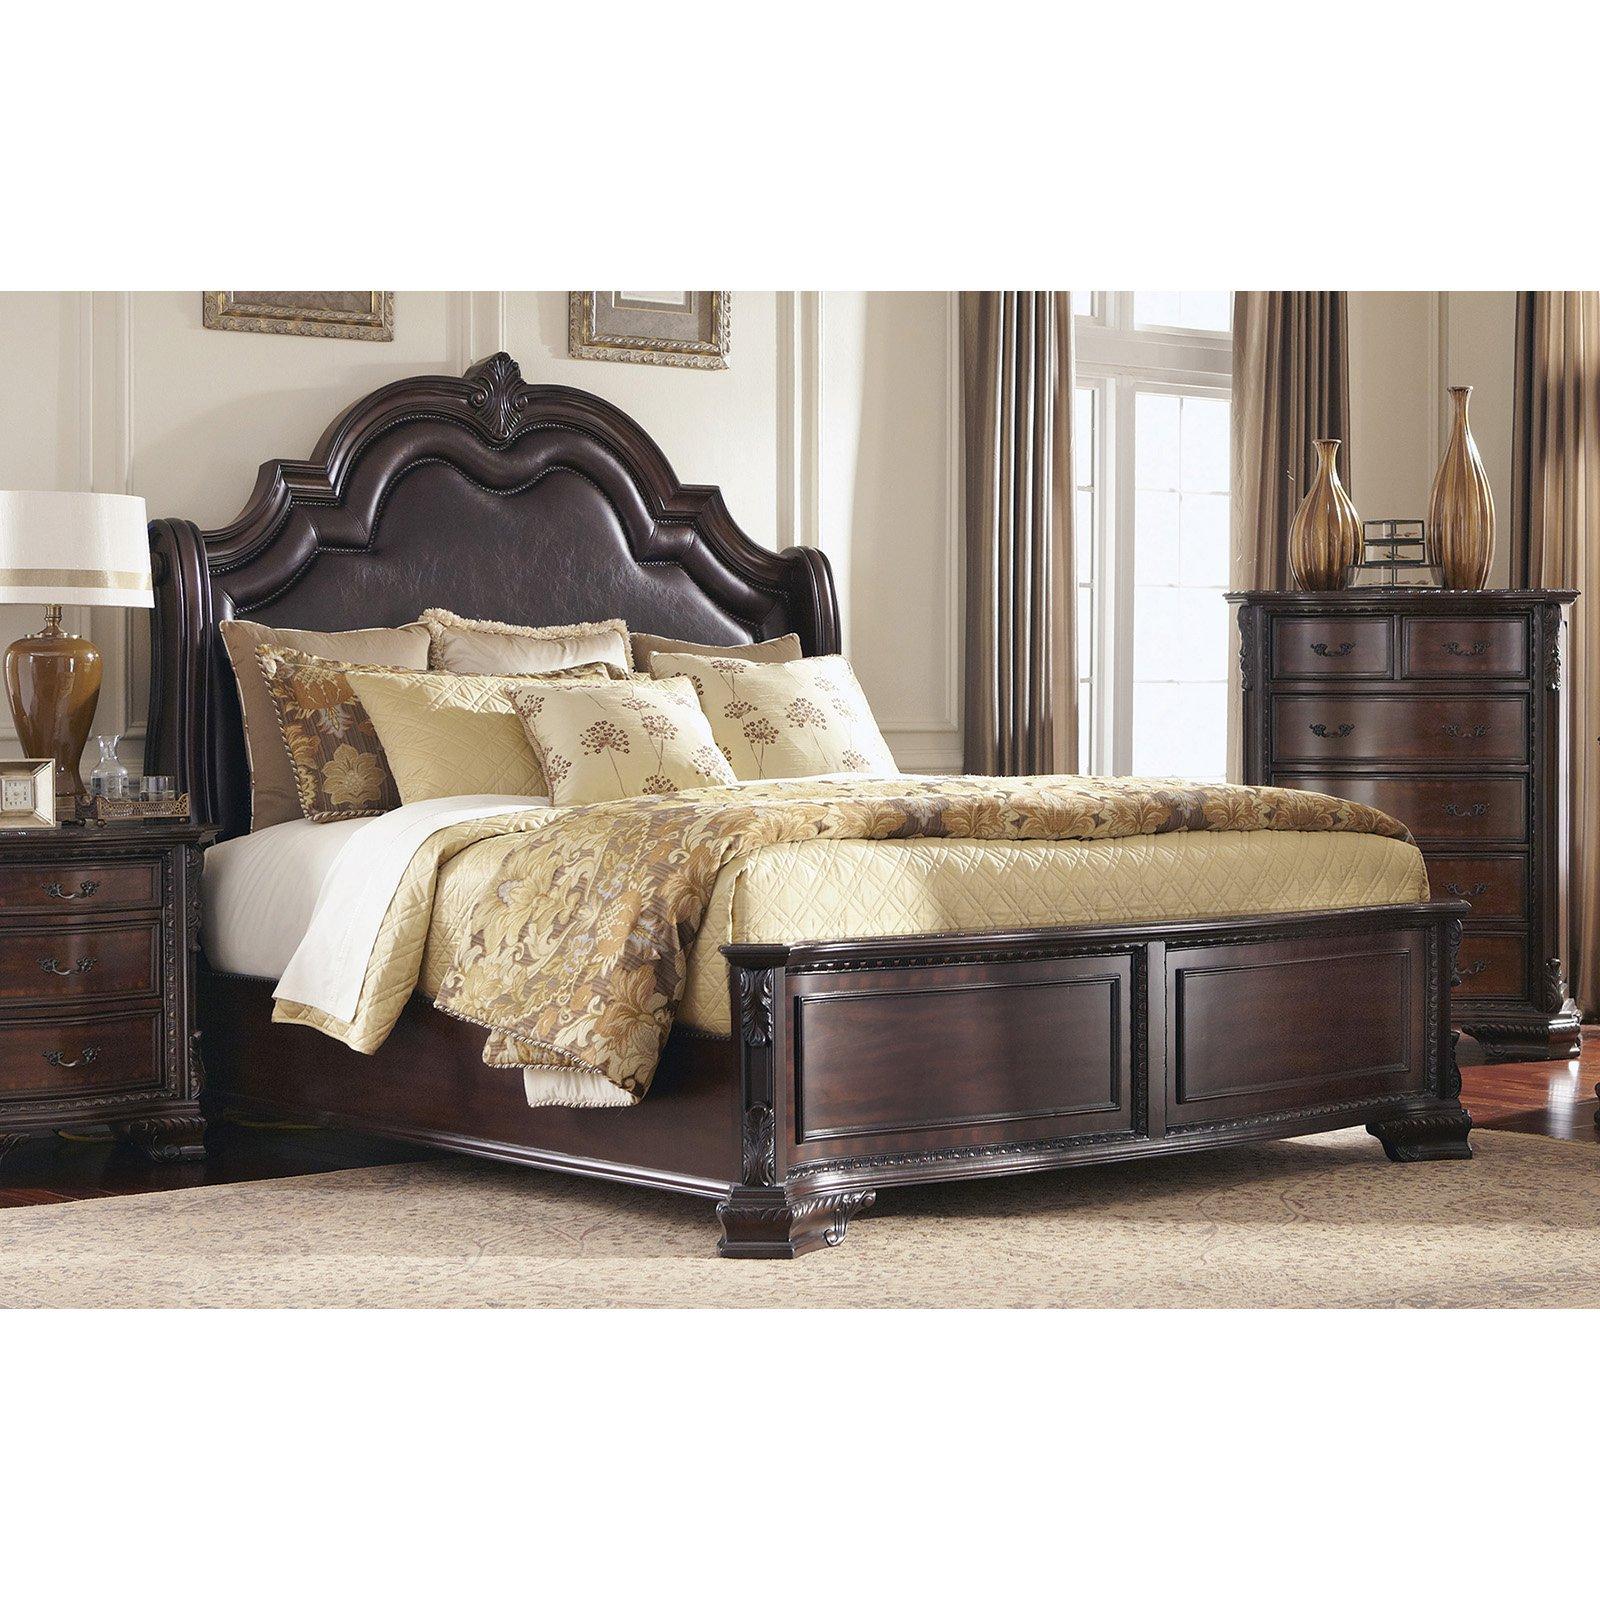 Coaster Furniture Maddison Upholstered Bed